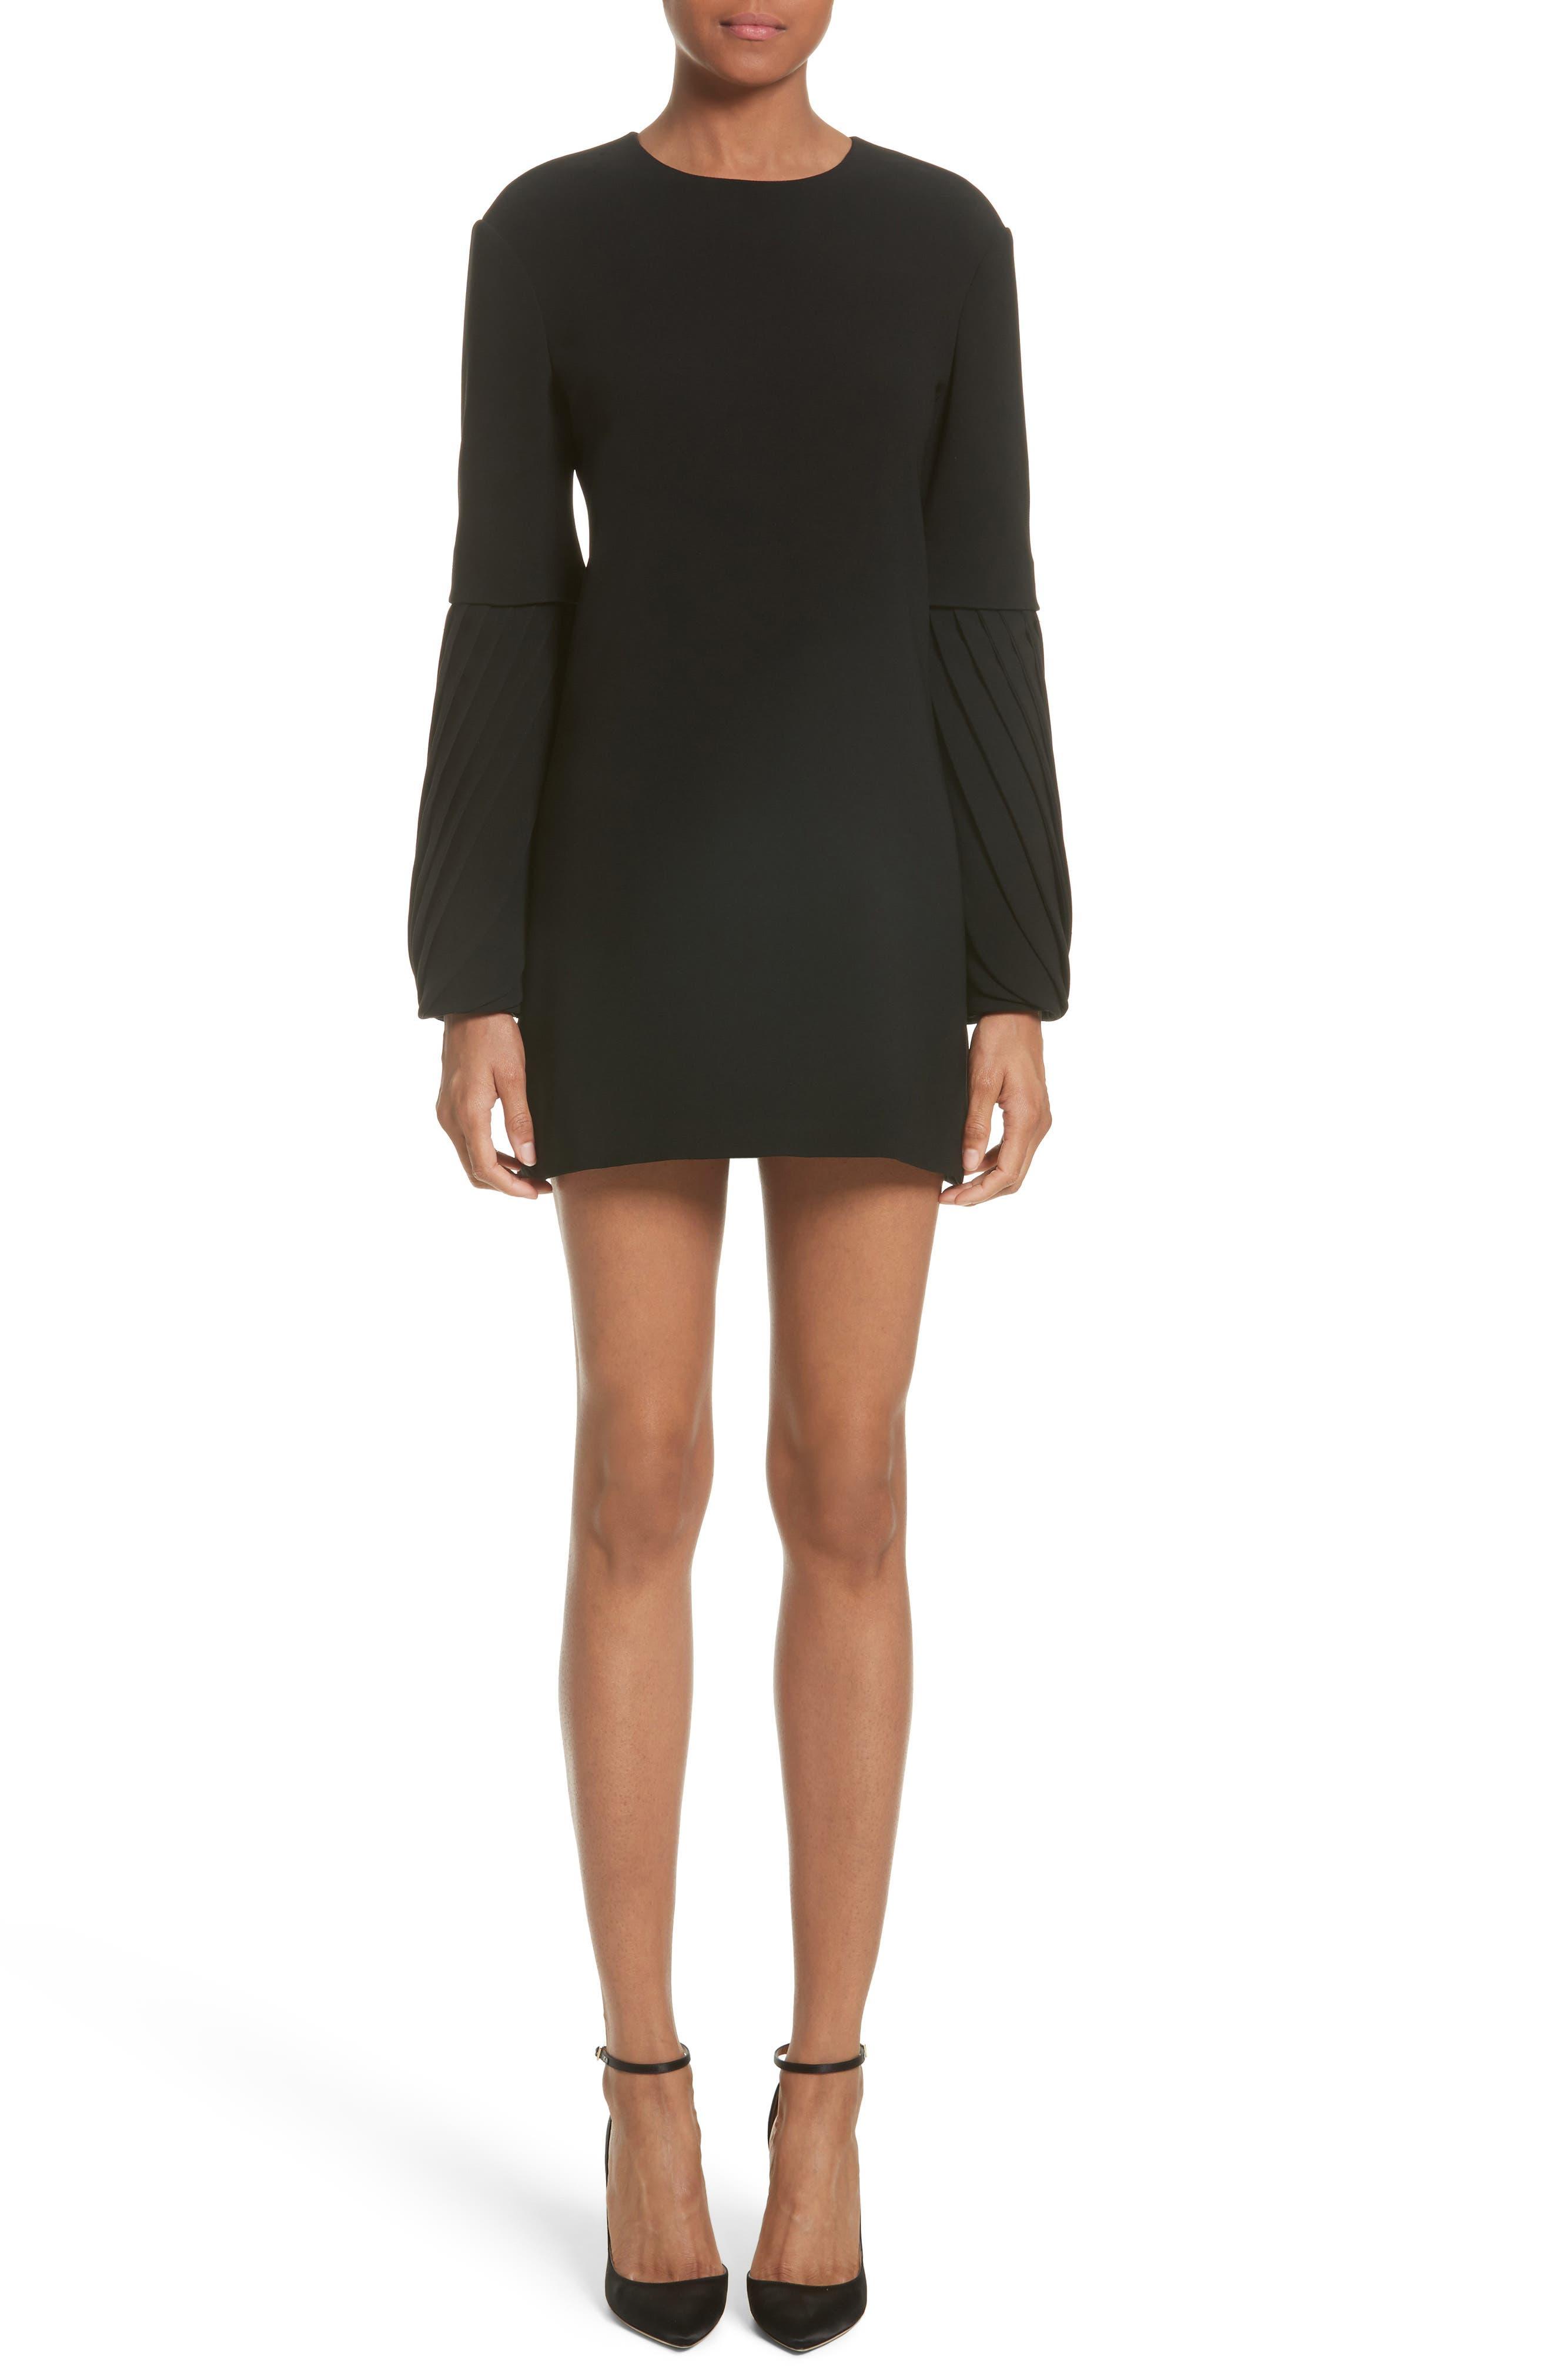 Alternate Image 1 Selected - Brandon Maxwell Petal Sleeve Crepe Dress